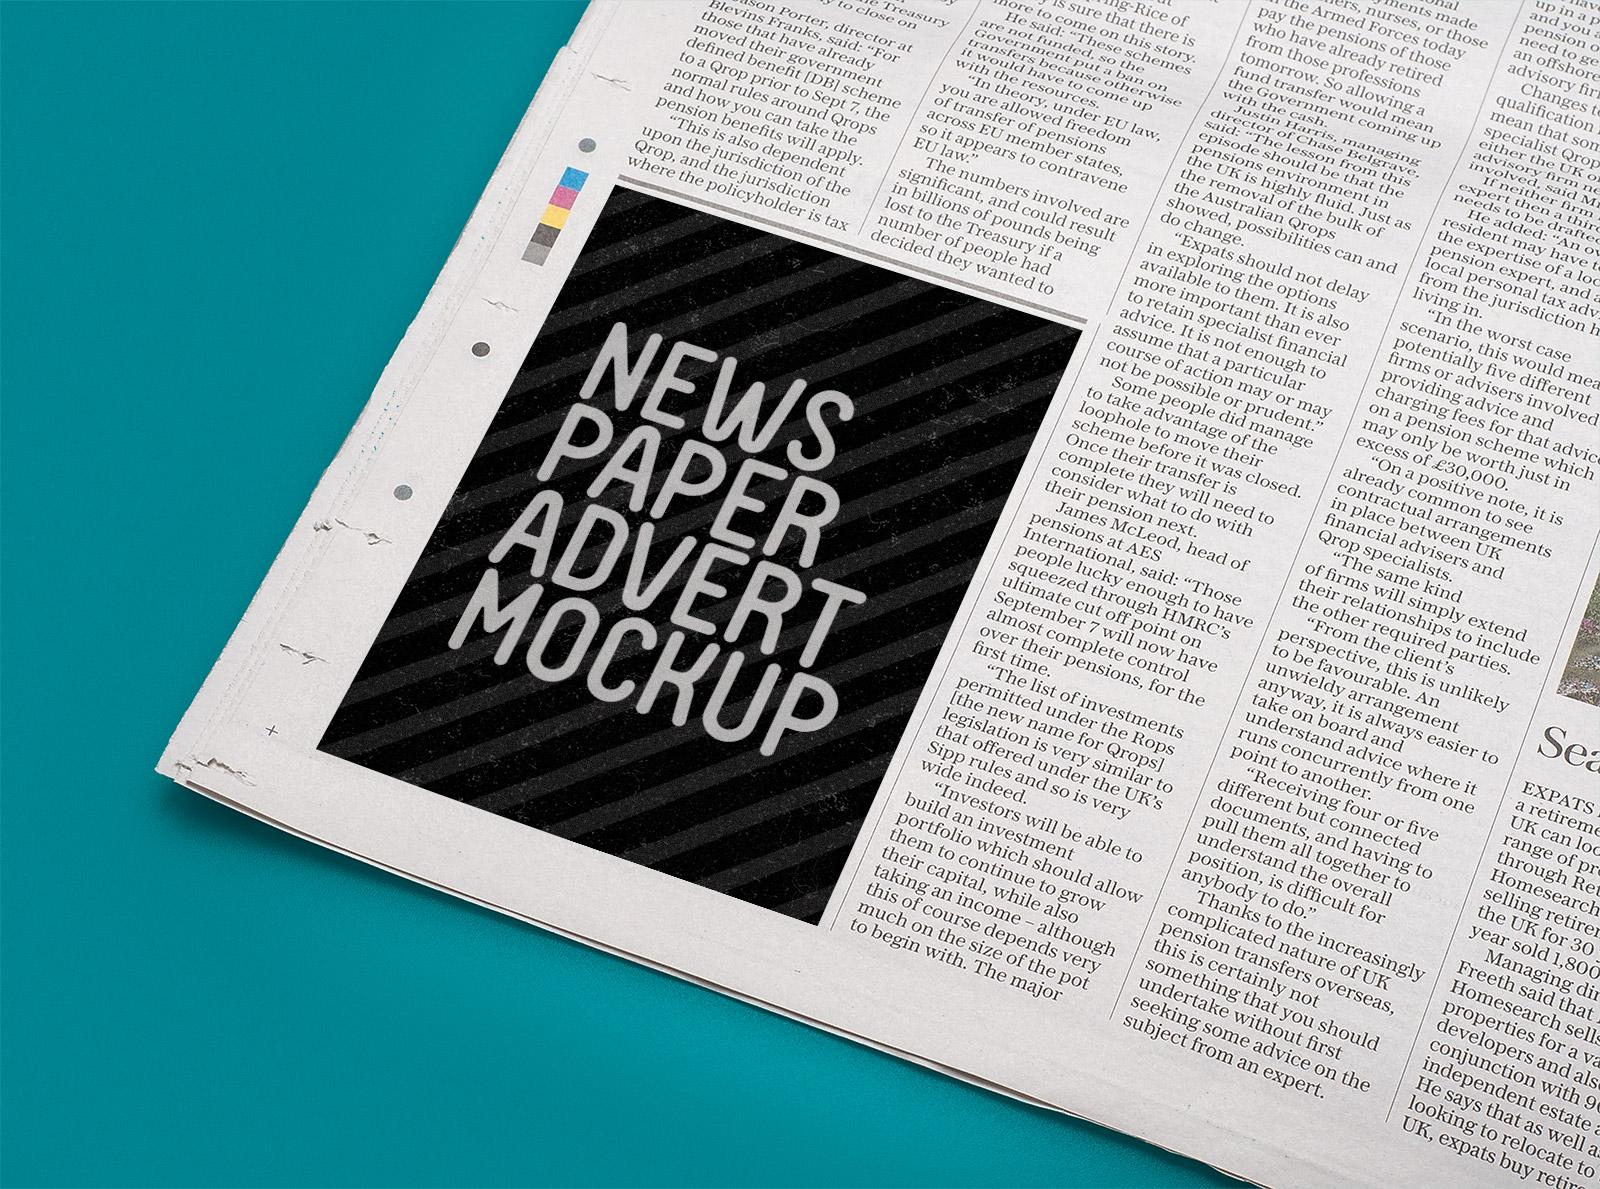 Free-Vertical-Newspaper-Advert-Mockup-PSD